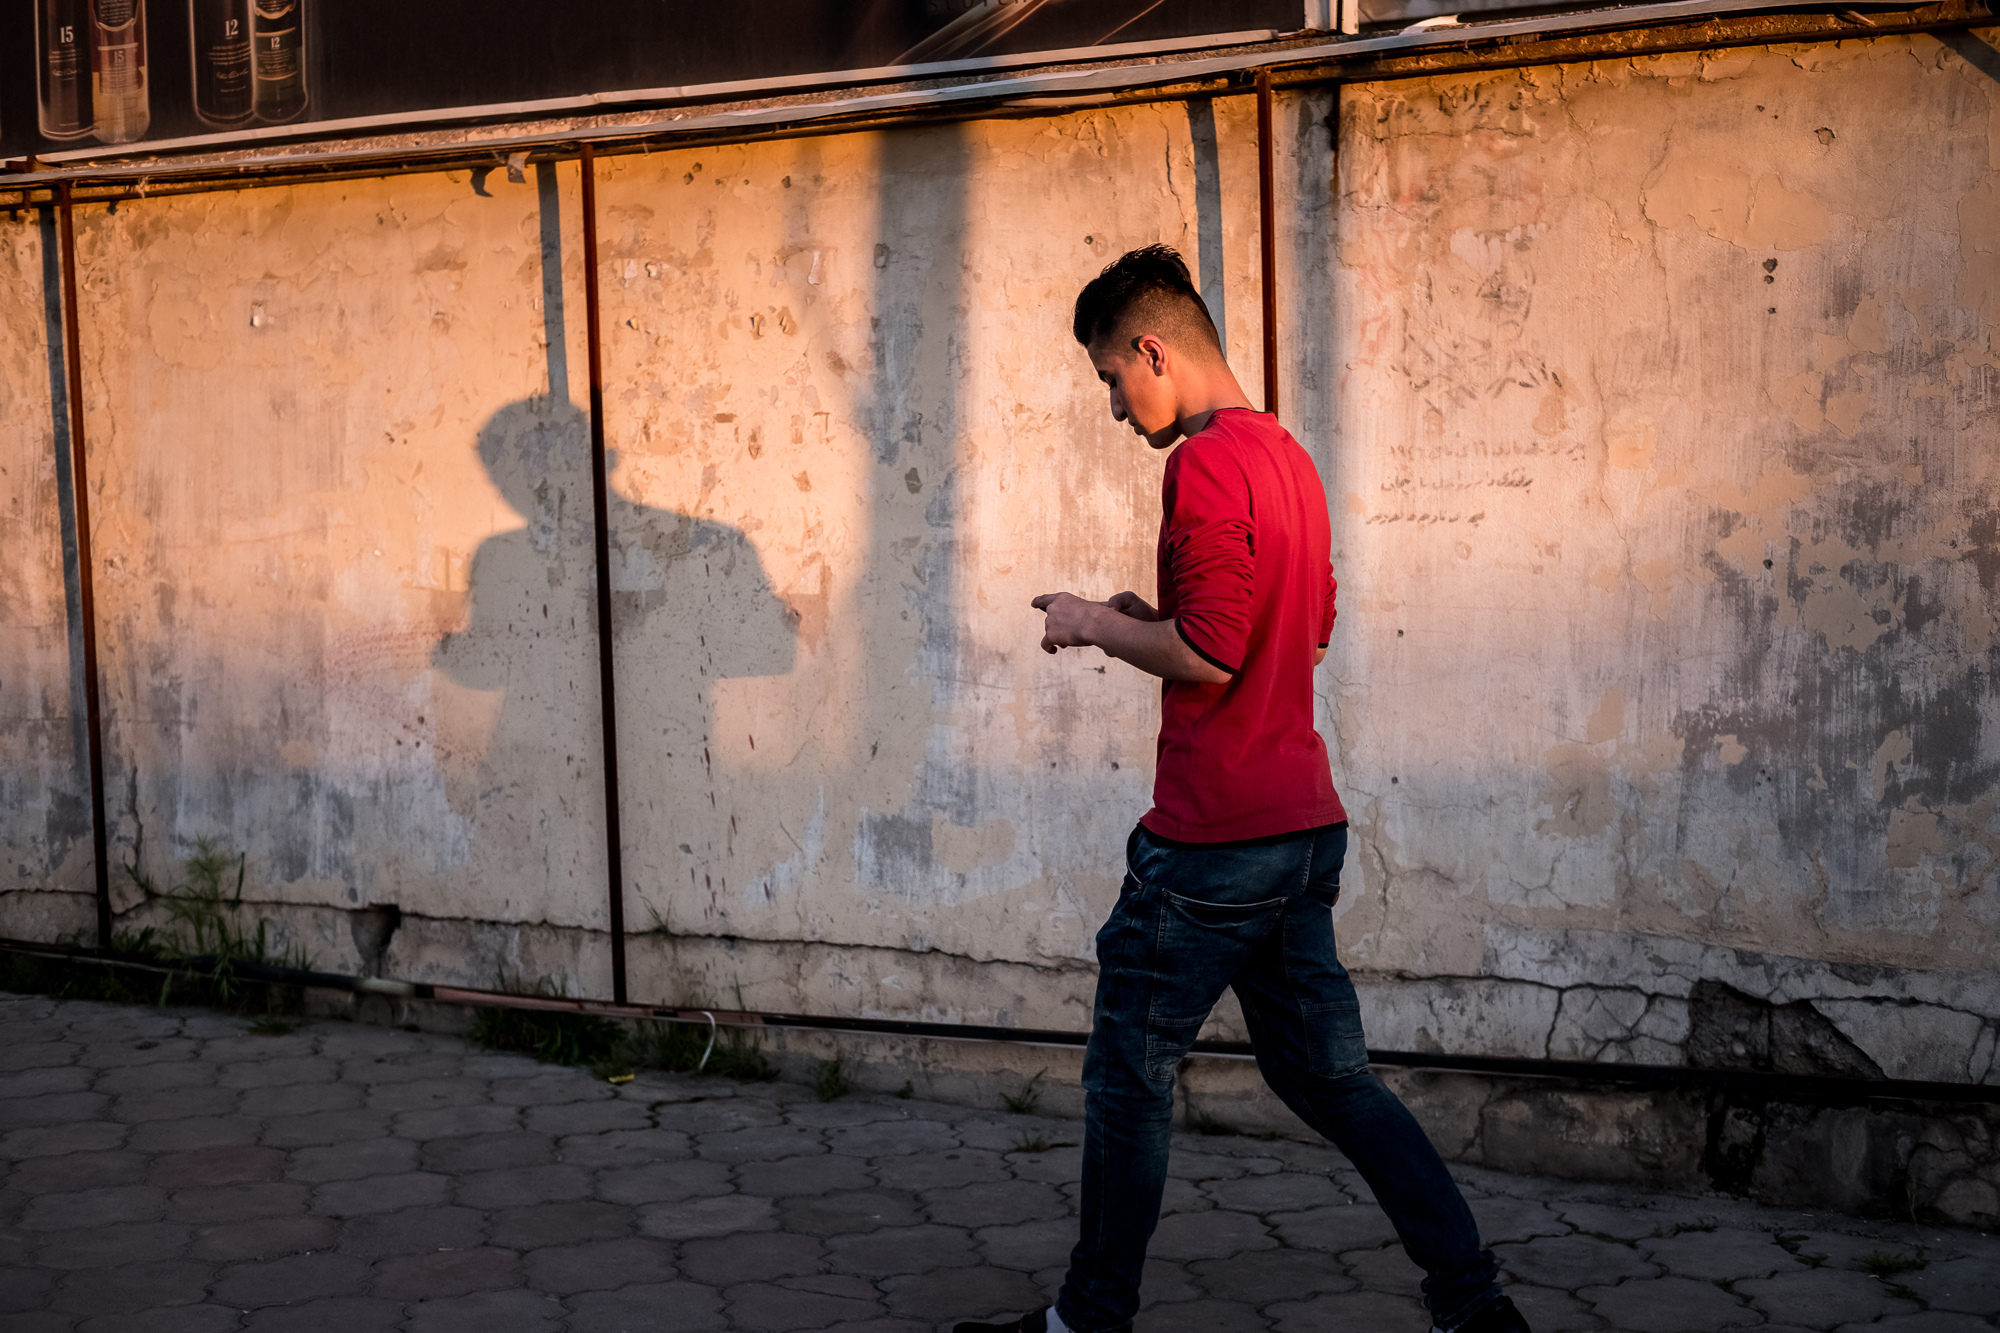 16 avril 2016 : Un homme marche dans une rue du quartier chrétien d'Ankawa, Erbil, Kurdistan irakien. Irak - © Jean-Matthieu Gautier / CIRIC - X-Pro 2 - XF 35mm f/2 WR à f/3.2 - 1/1250 - ISO 800